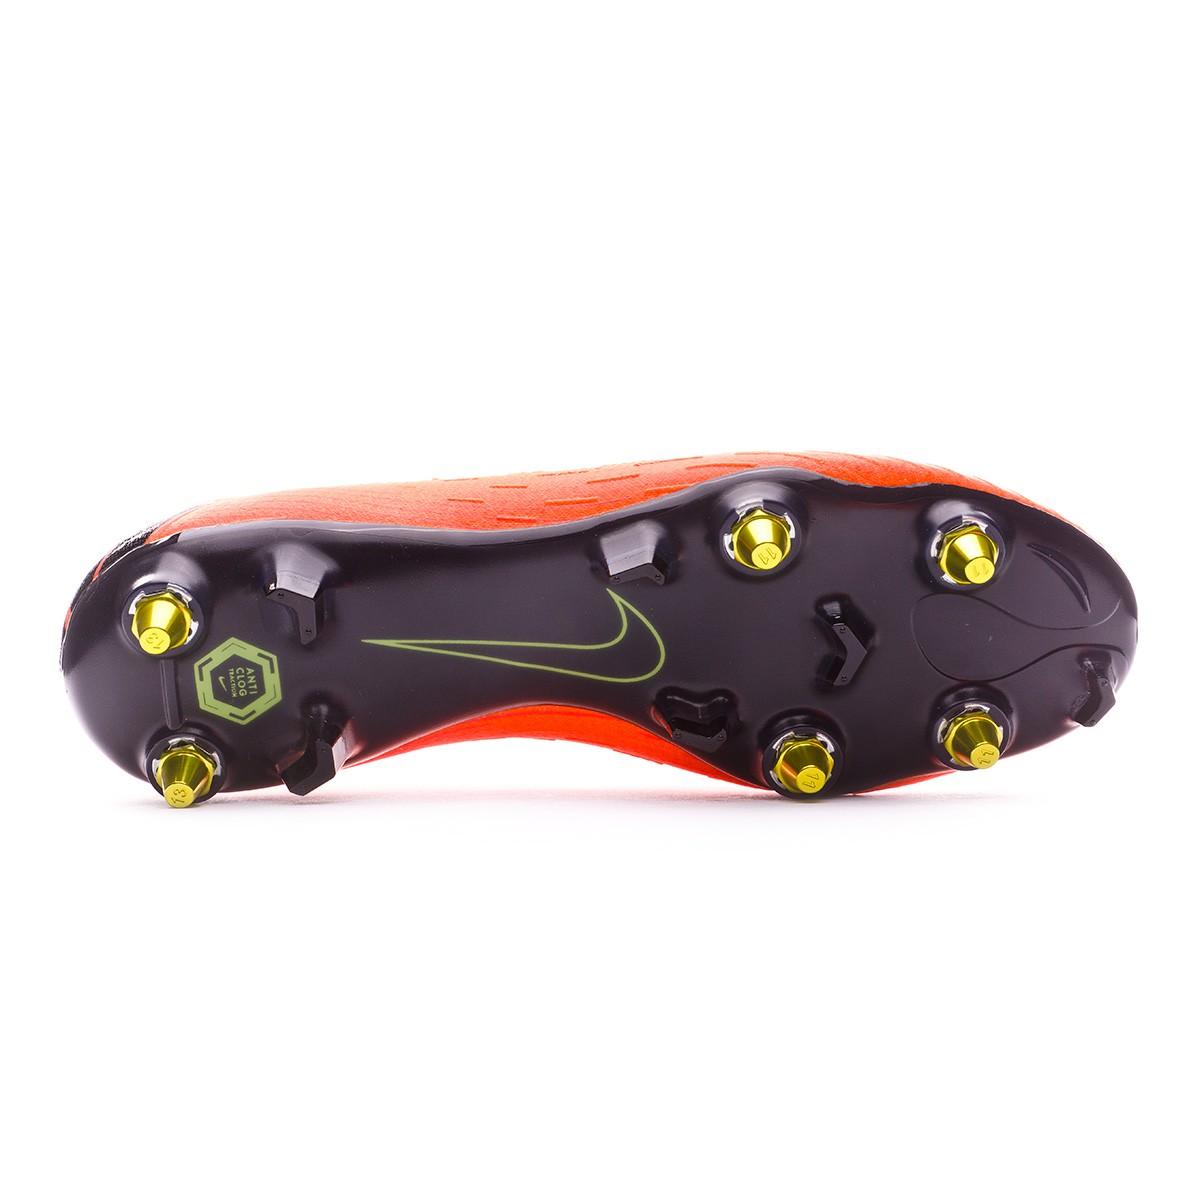 370d2d56036b9 Bota de fútbol Nike Mercurial Vapor XII Elite SG-Pro Anti-Clog Total  orange-Black-Volt - Tienda de fútbol Fútbol Emotion